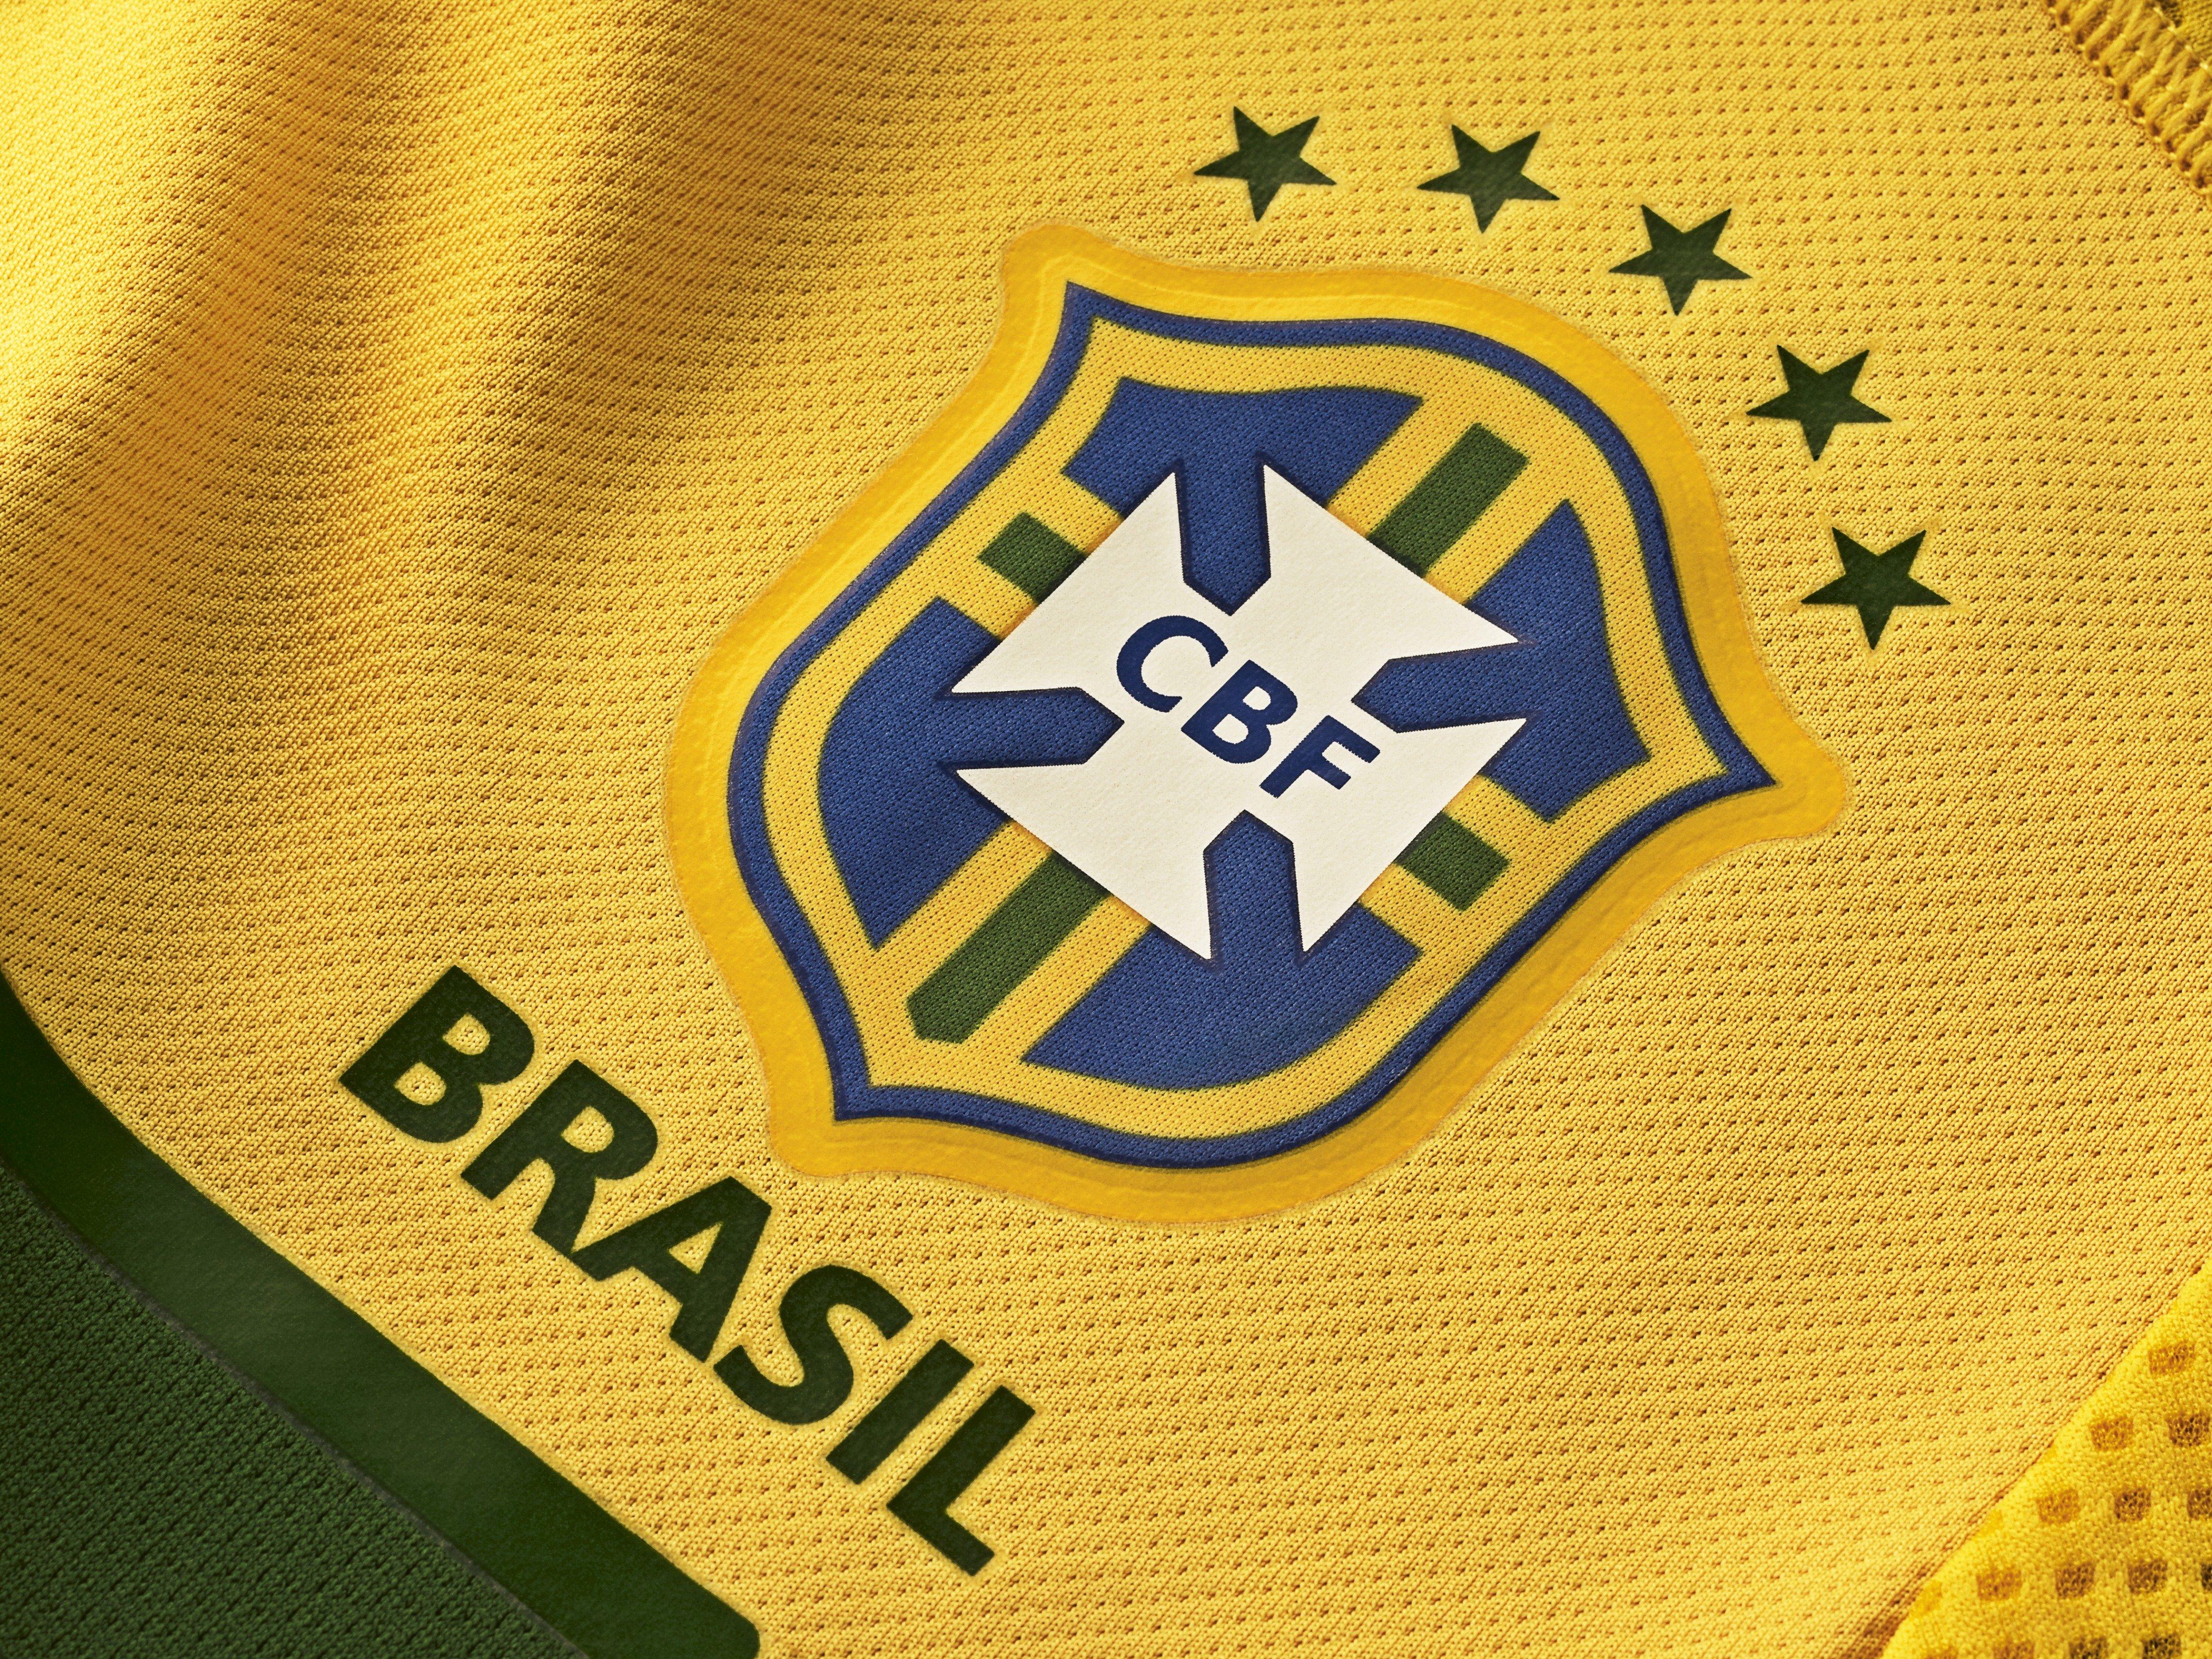 FIFA WORLD CUP Brazil soccer 69 wallpaper 4500x3375 4500x3375